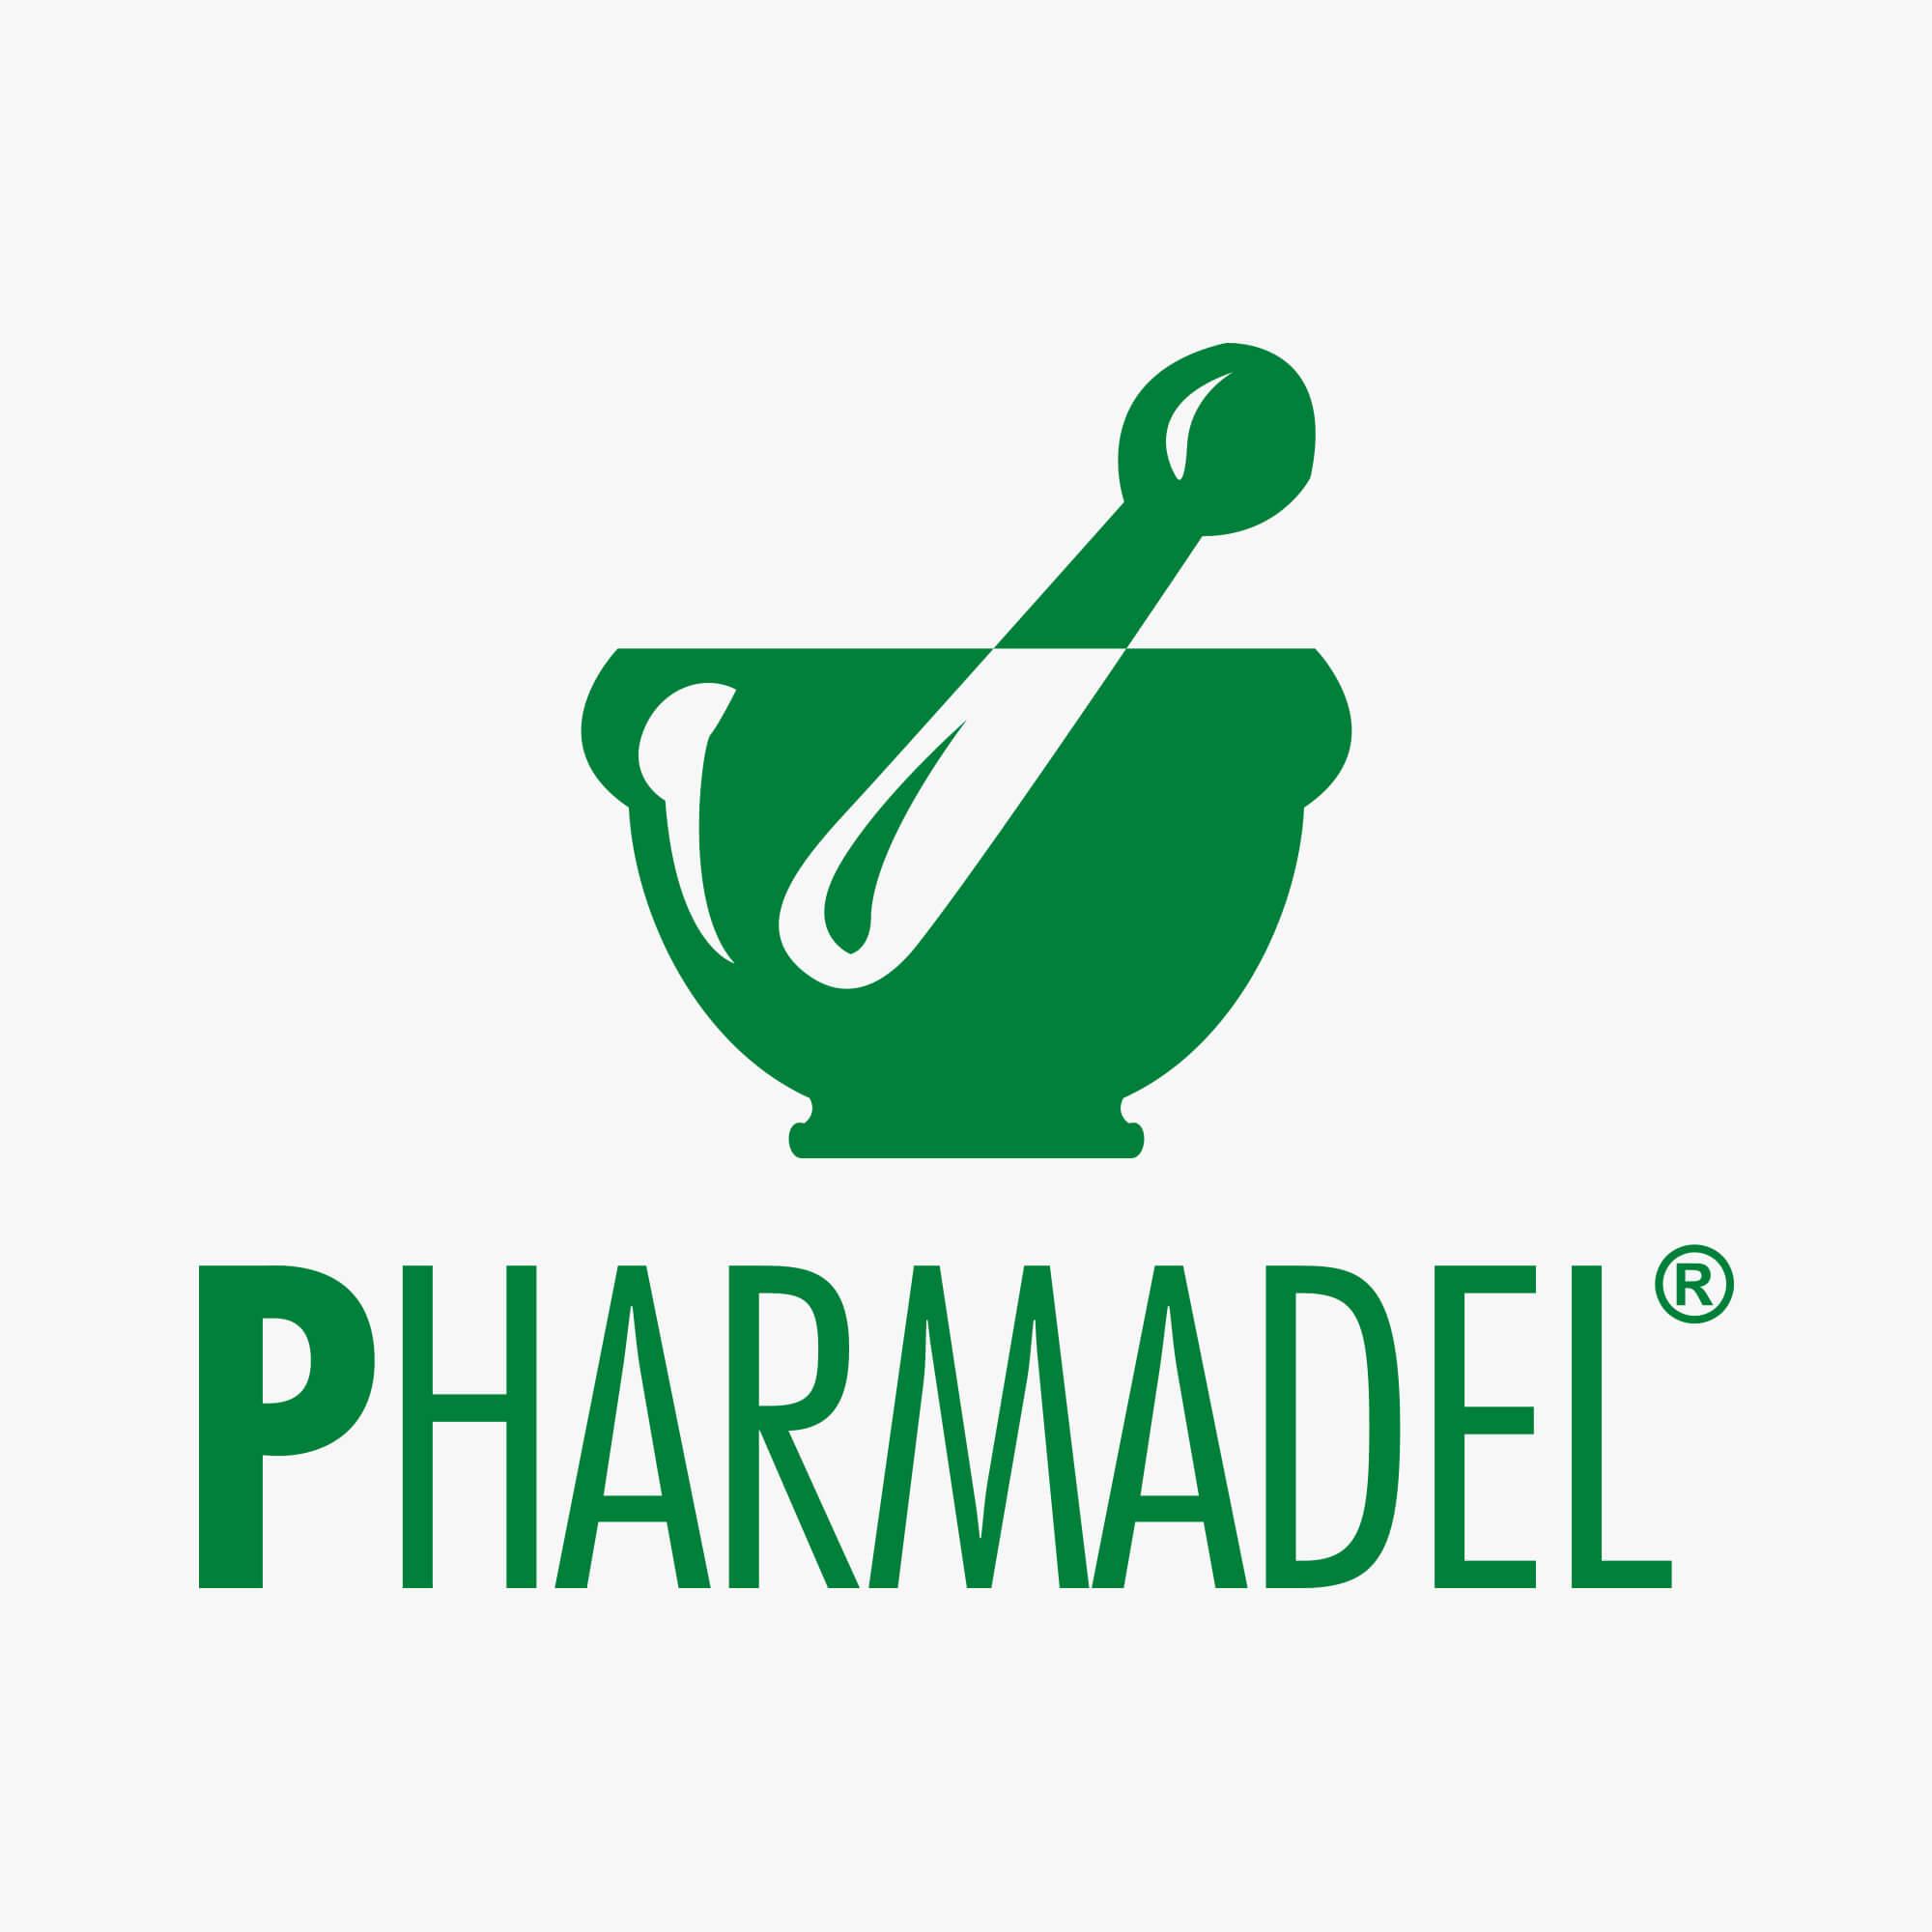 agencia-de-manejo-de-redes-sociales-colateral-pharmadel-rrss-1